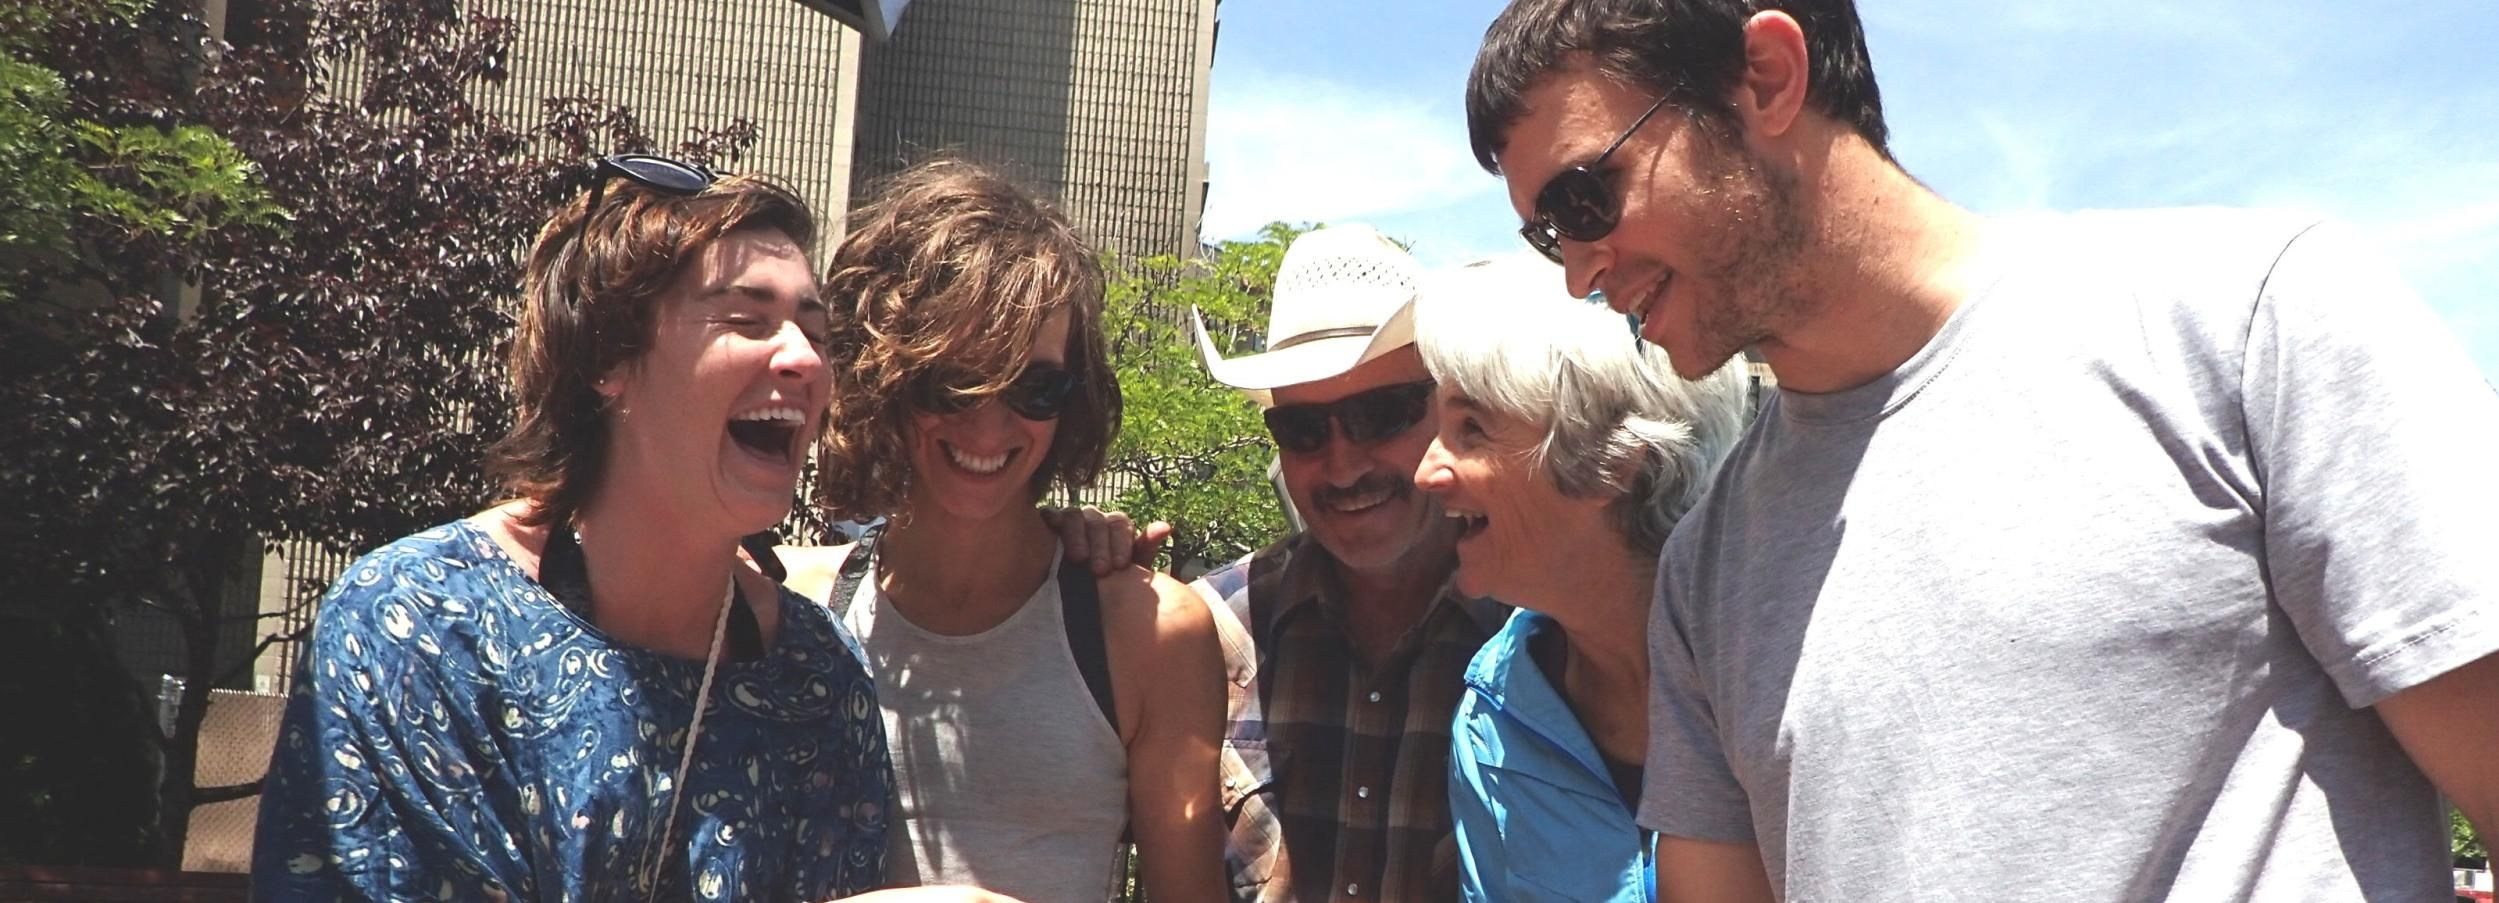 Increíble aventura de búsqueda de tesoros en Golden Colorado